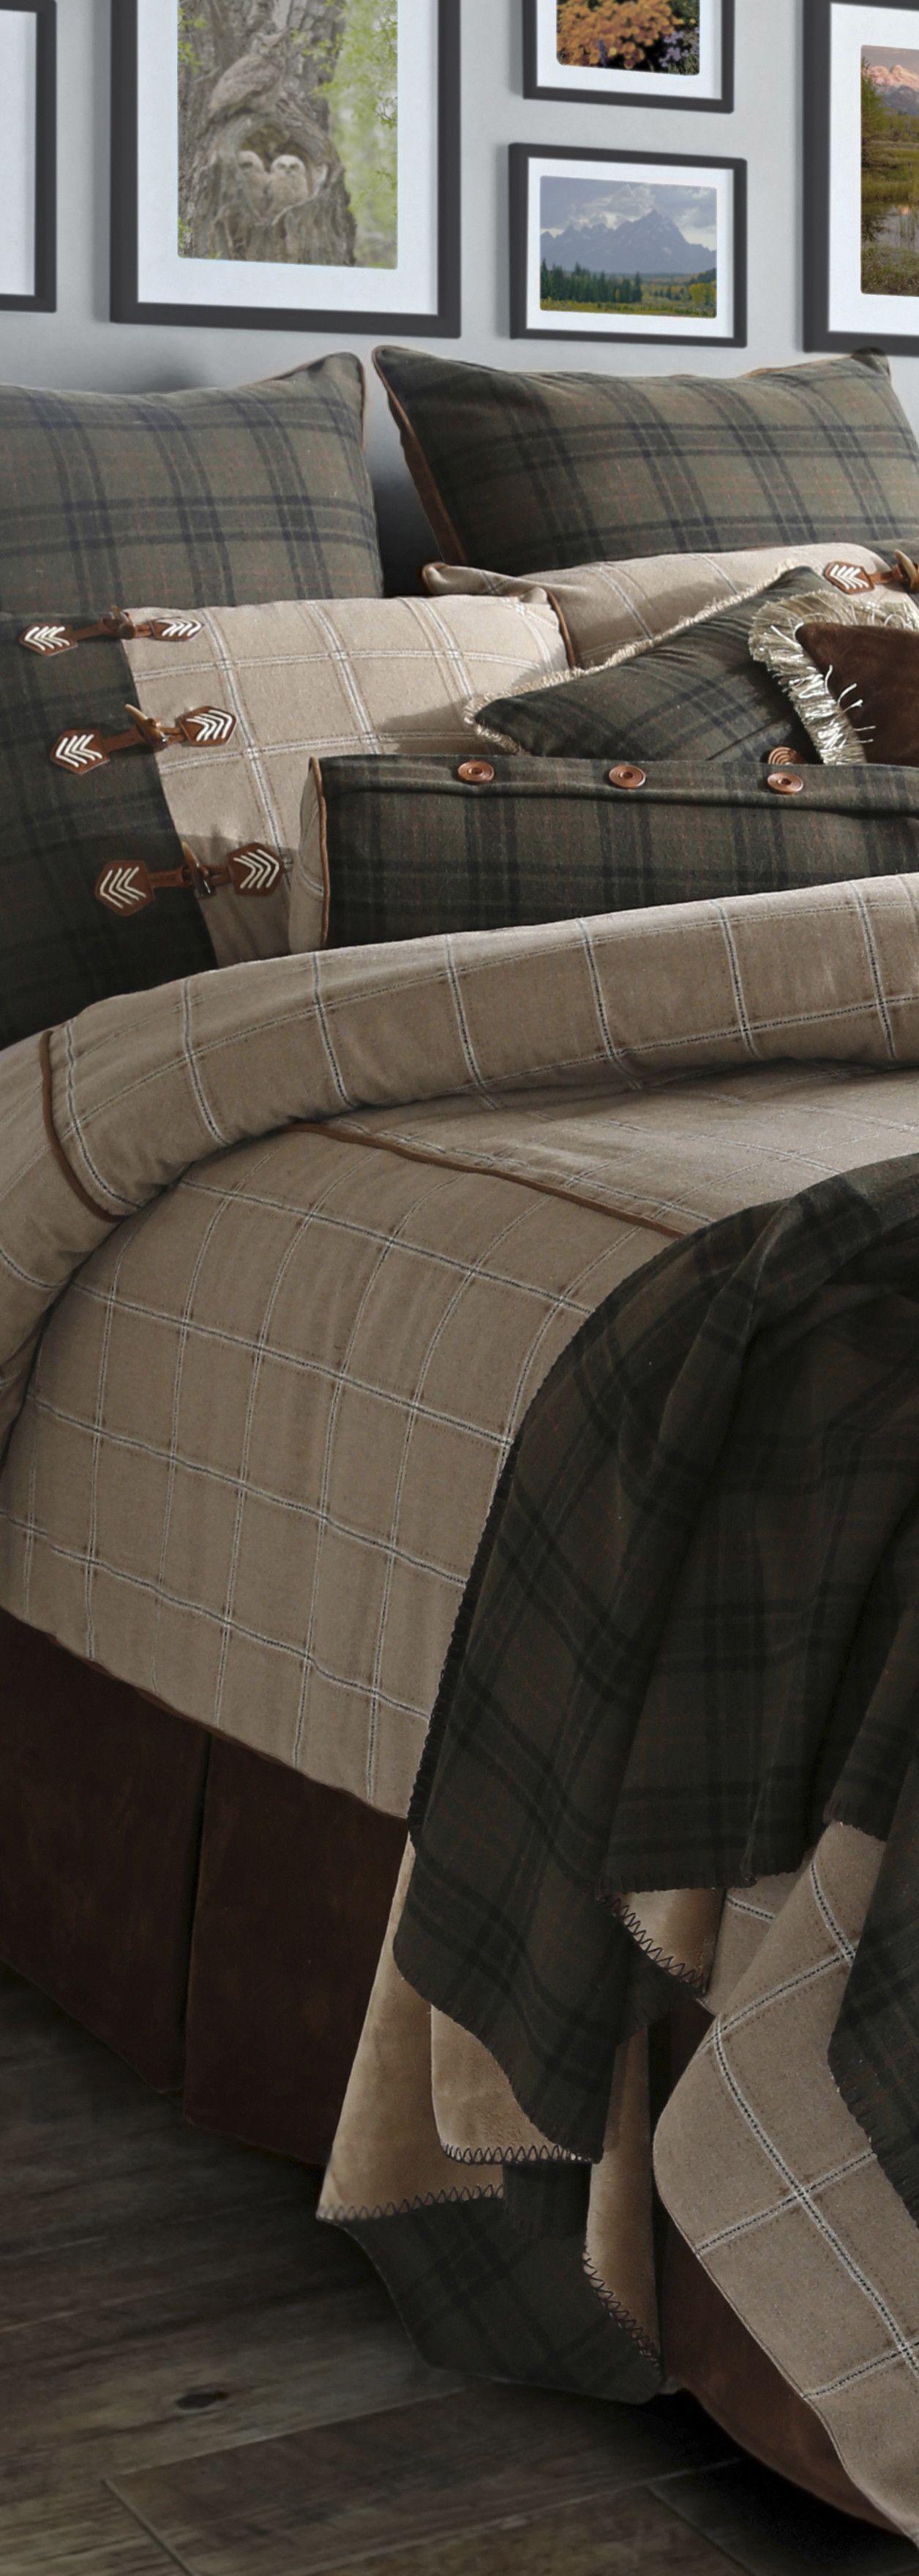 Cedar Hills Rustic Bedding Home Decor Luxury Bedding Rustic Bedding Sets Luxury Bedding Master Bedroom